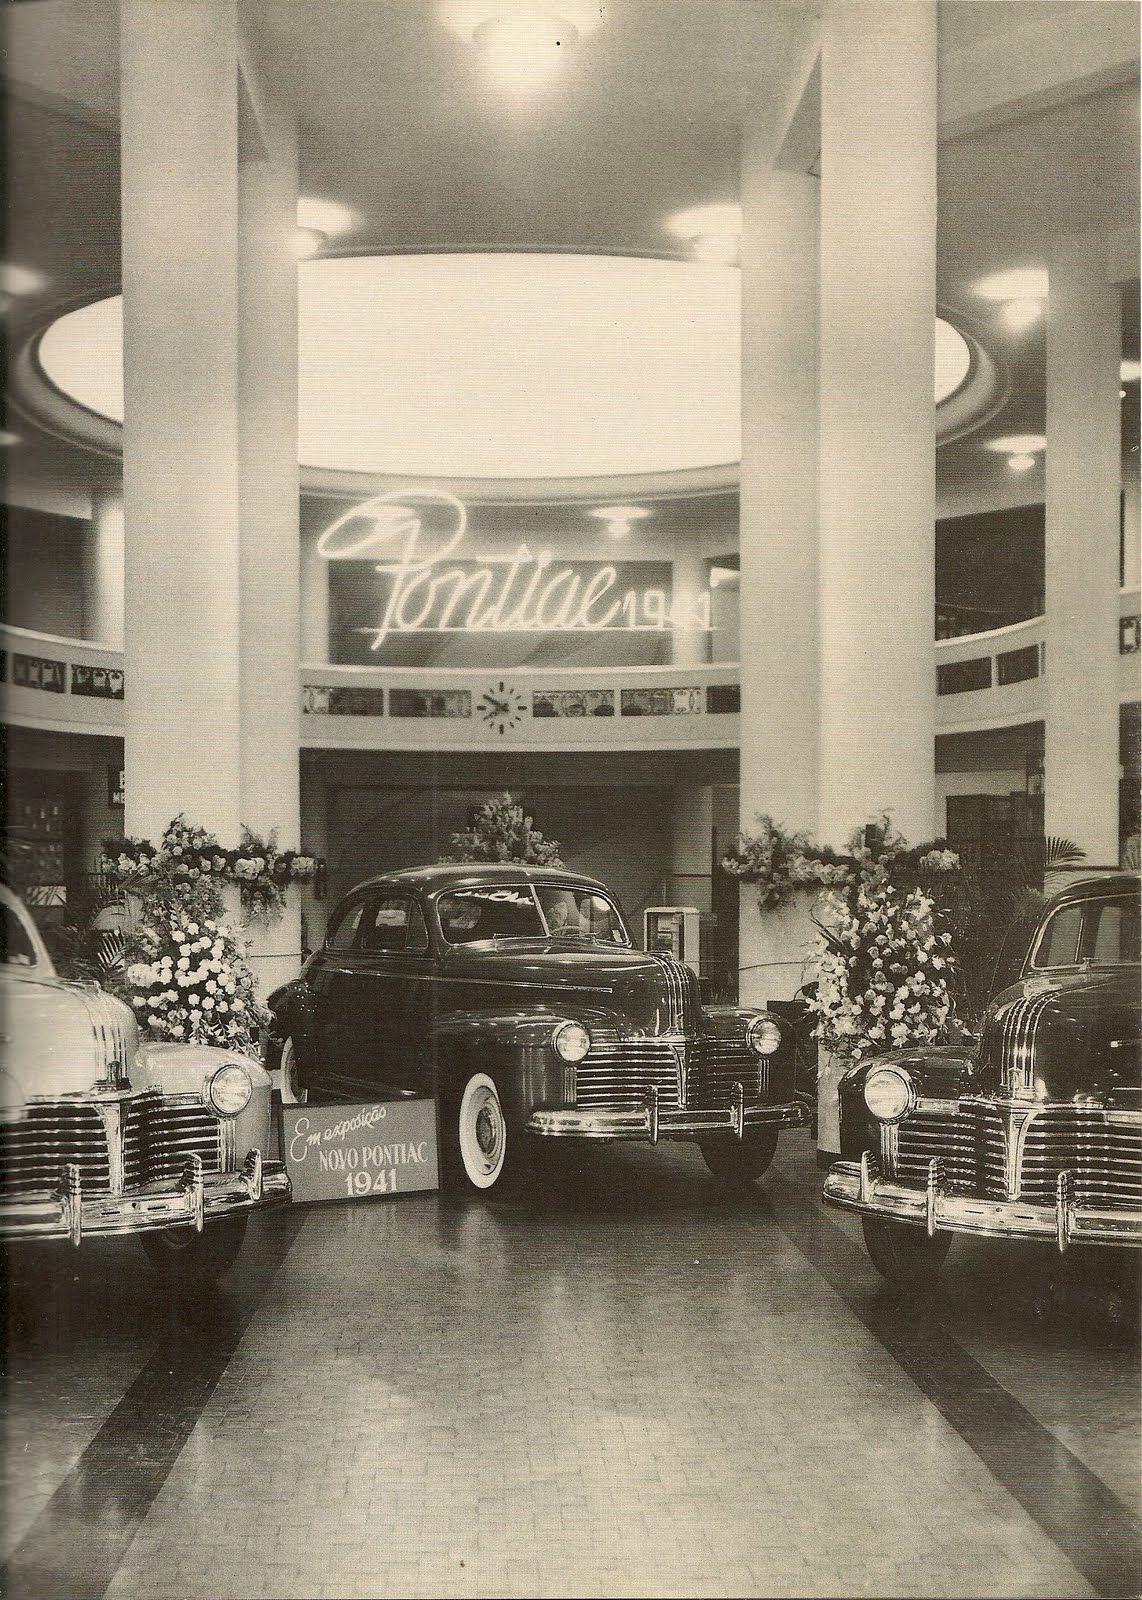 antigas lojas de são paulo - Pesquisa Google | Fotos antigas